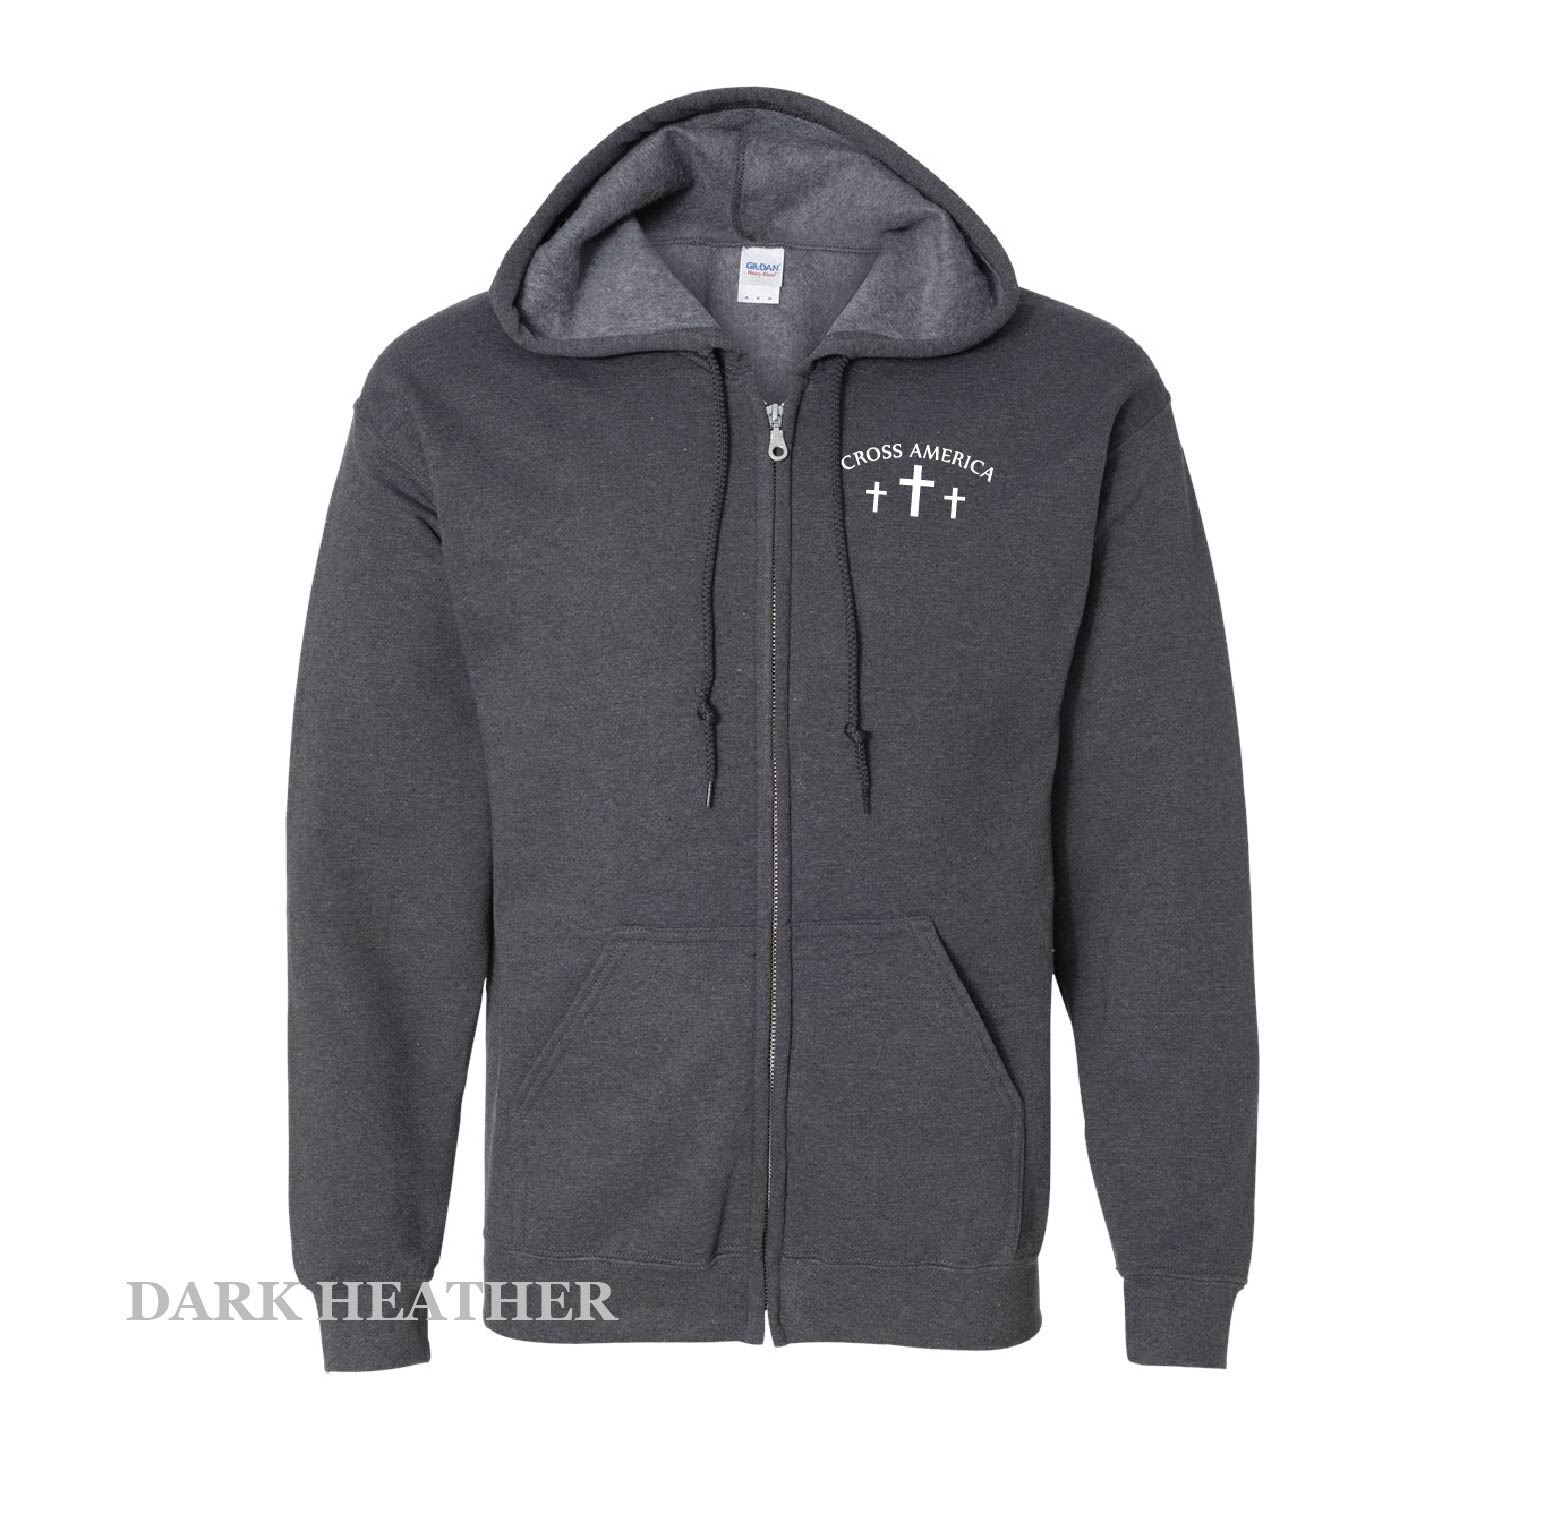 7ac0bb424a Full-Zip Hooded Sweatshirt